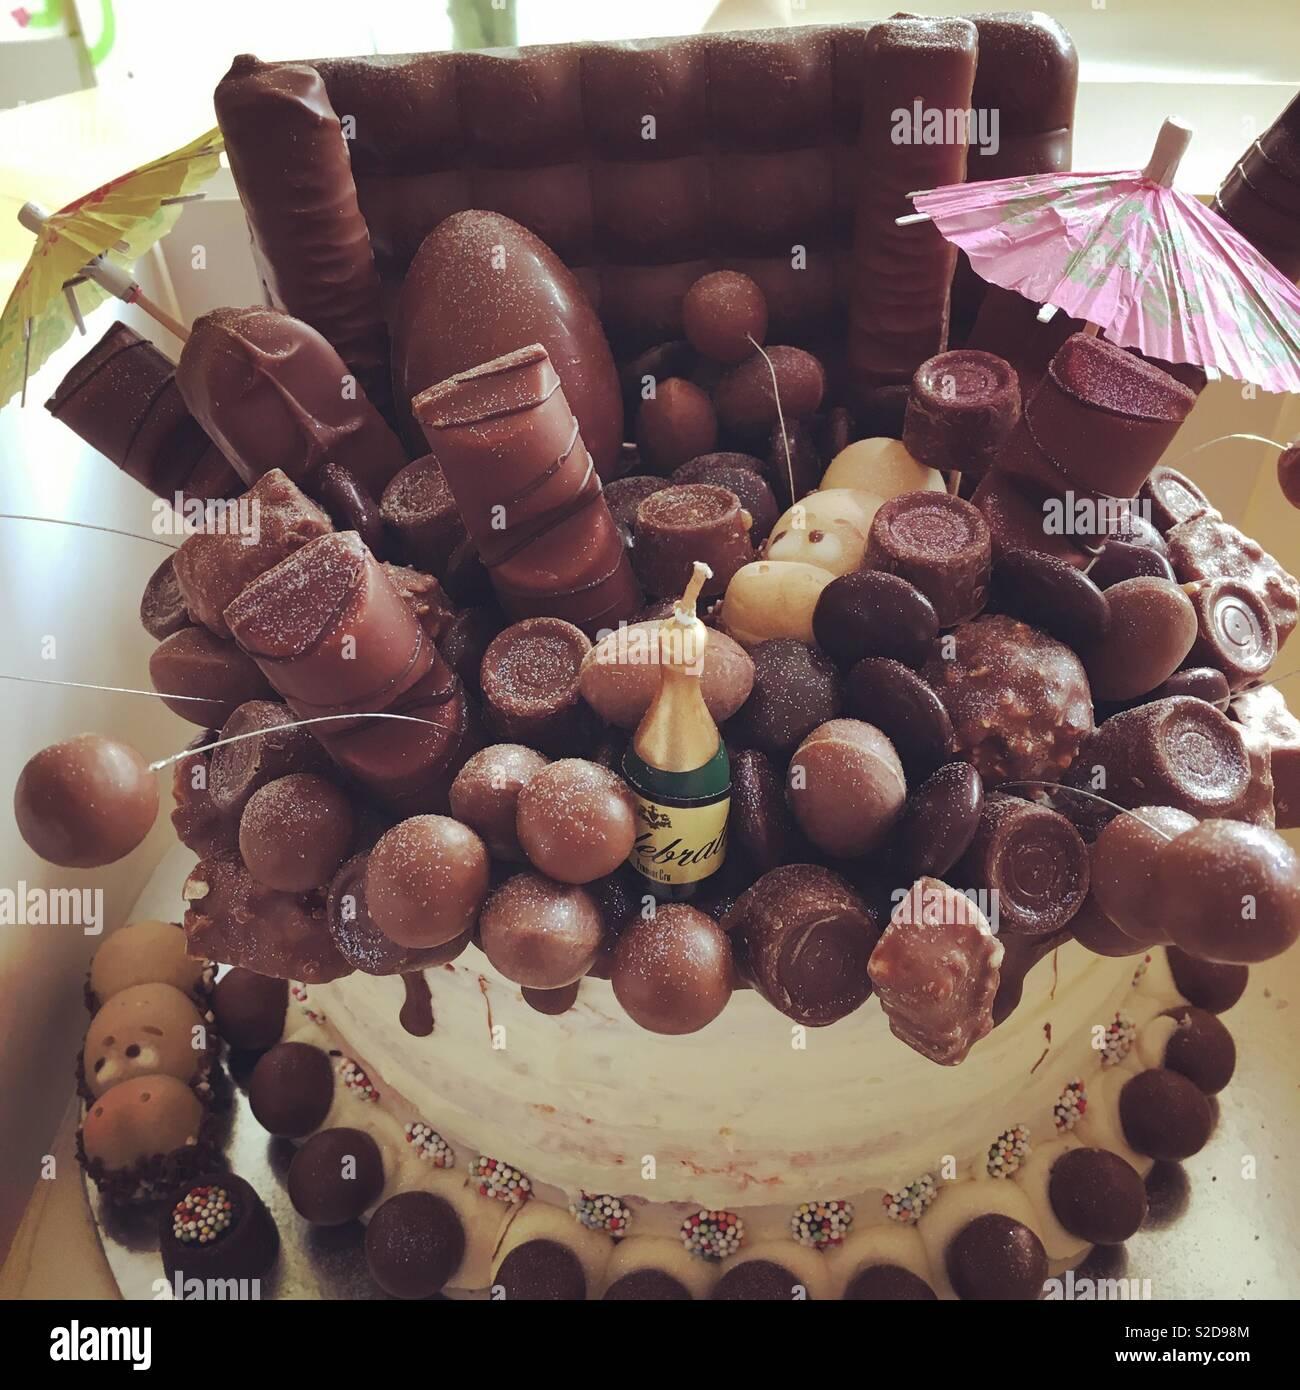 Chocolate birthday cake - Stock Image